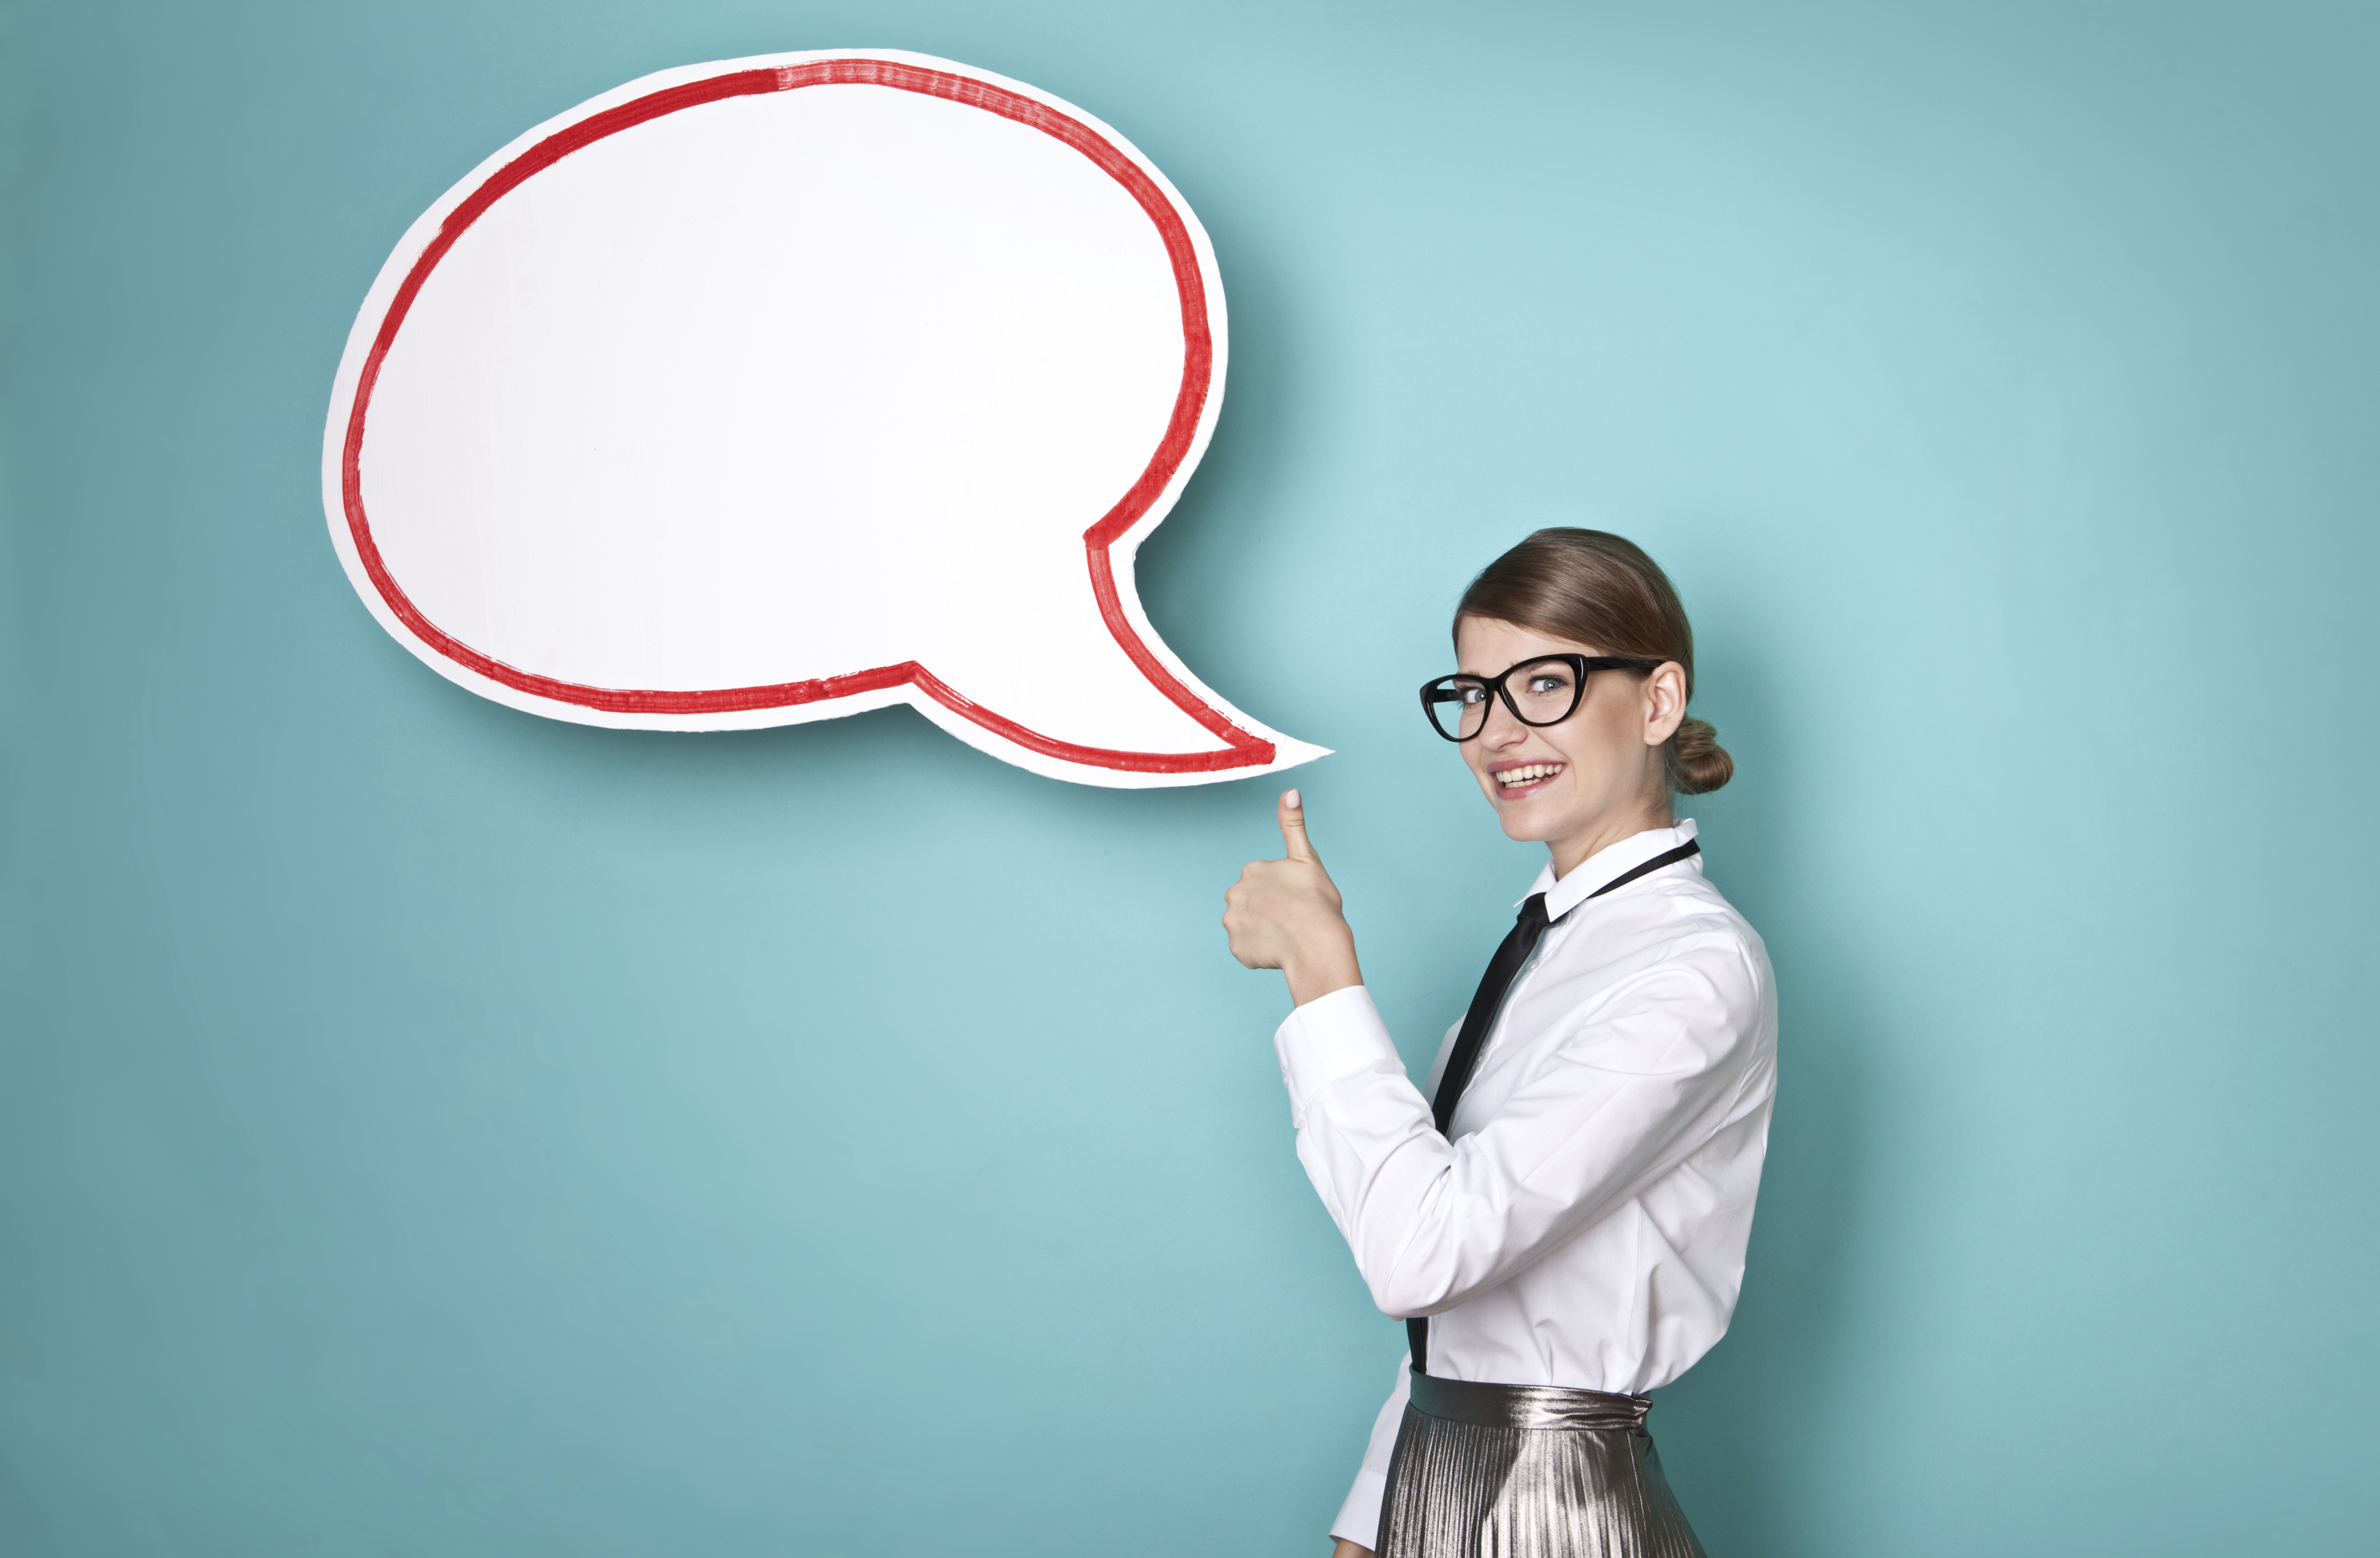 presentation content marketing ethos3 How to Use Presentations for Content Marketing